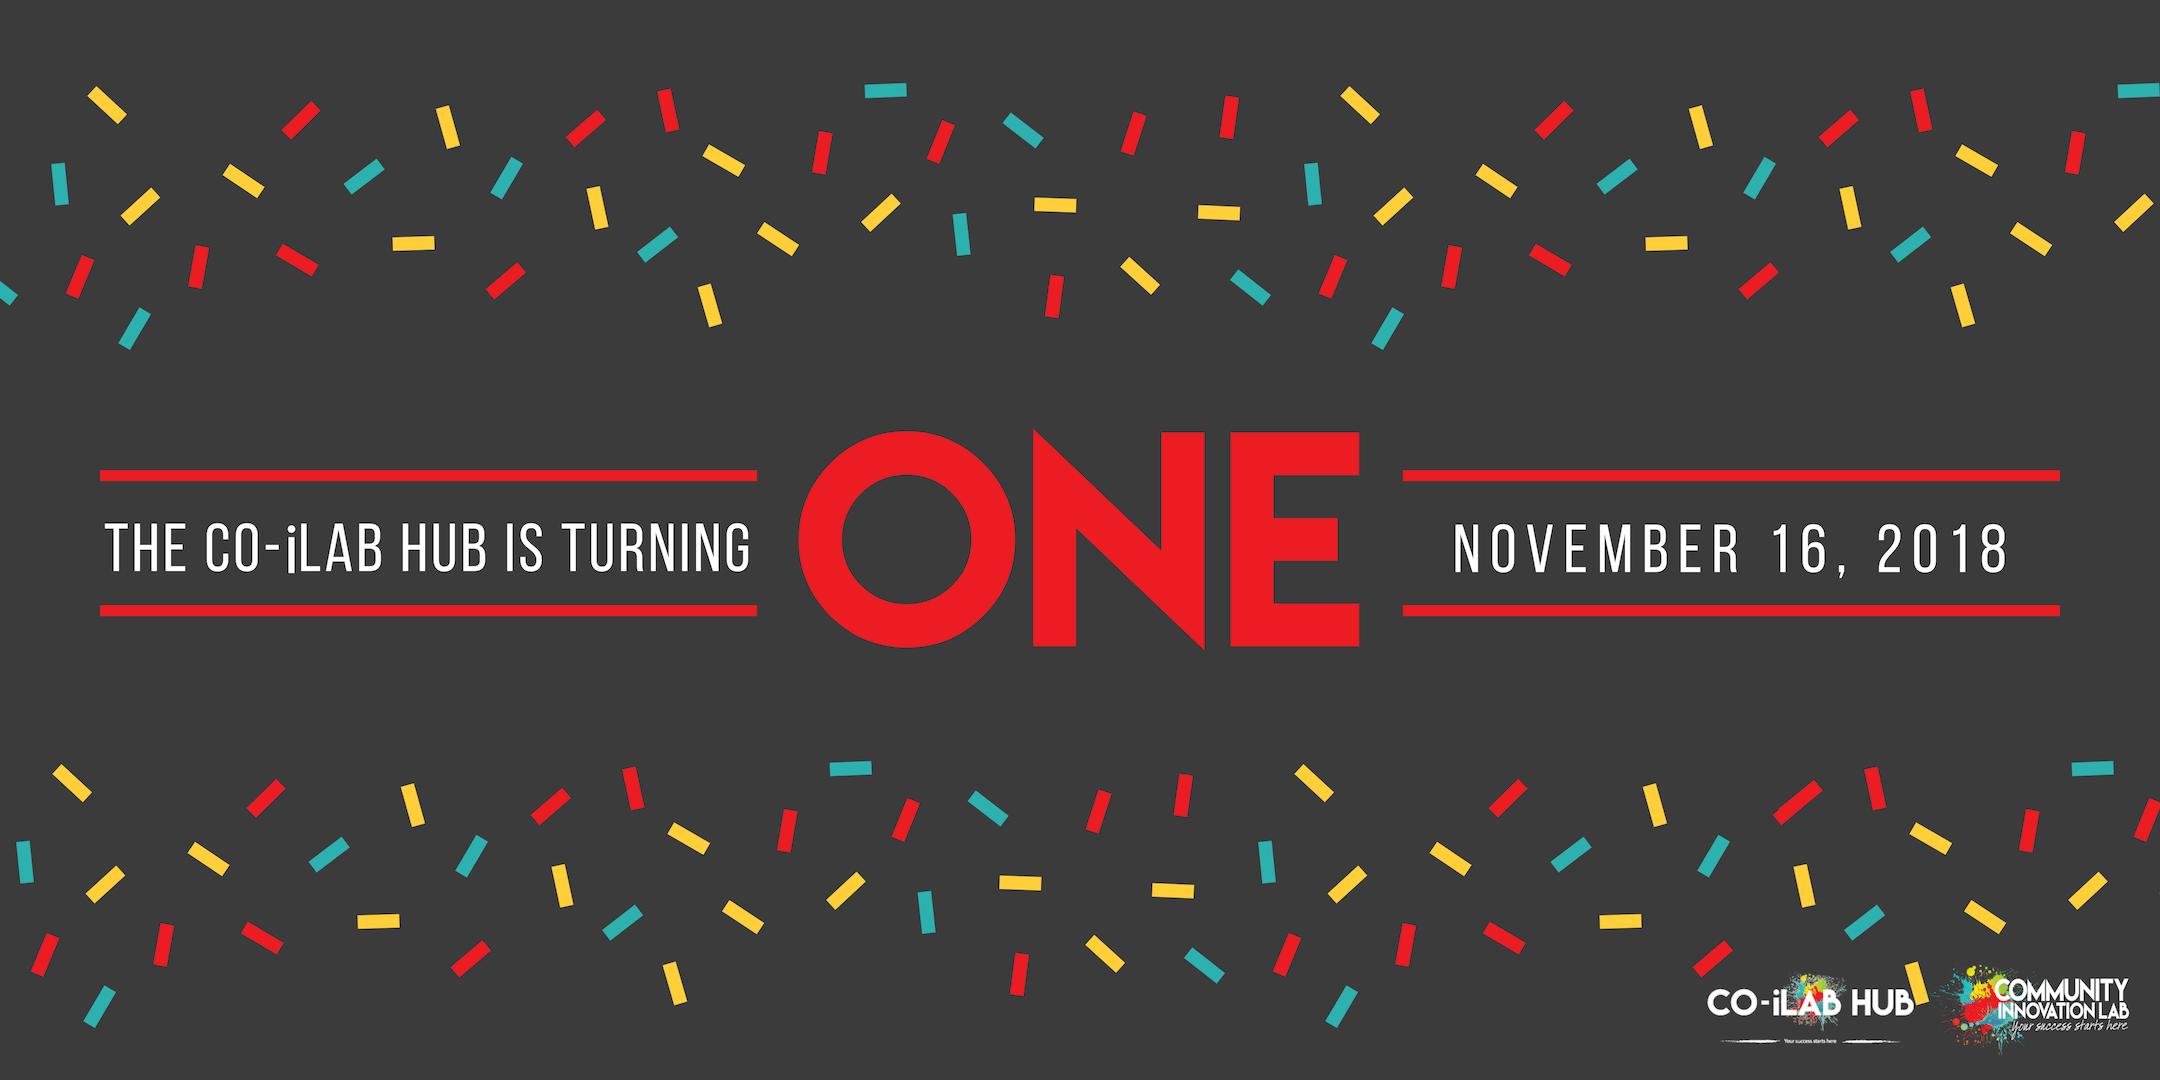 Co-iLab Hub 1 Year Anniversary!